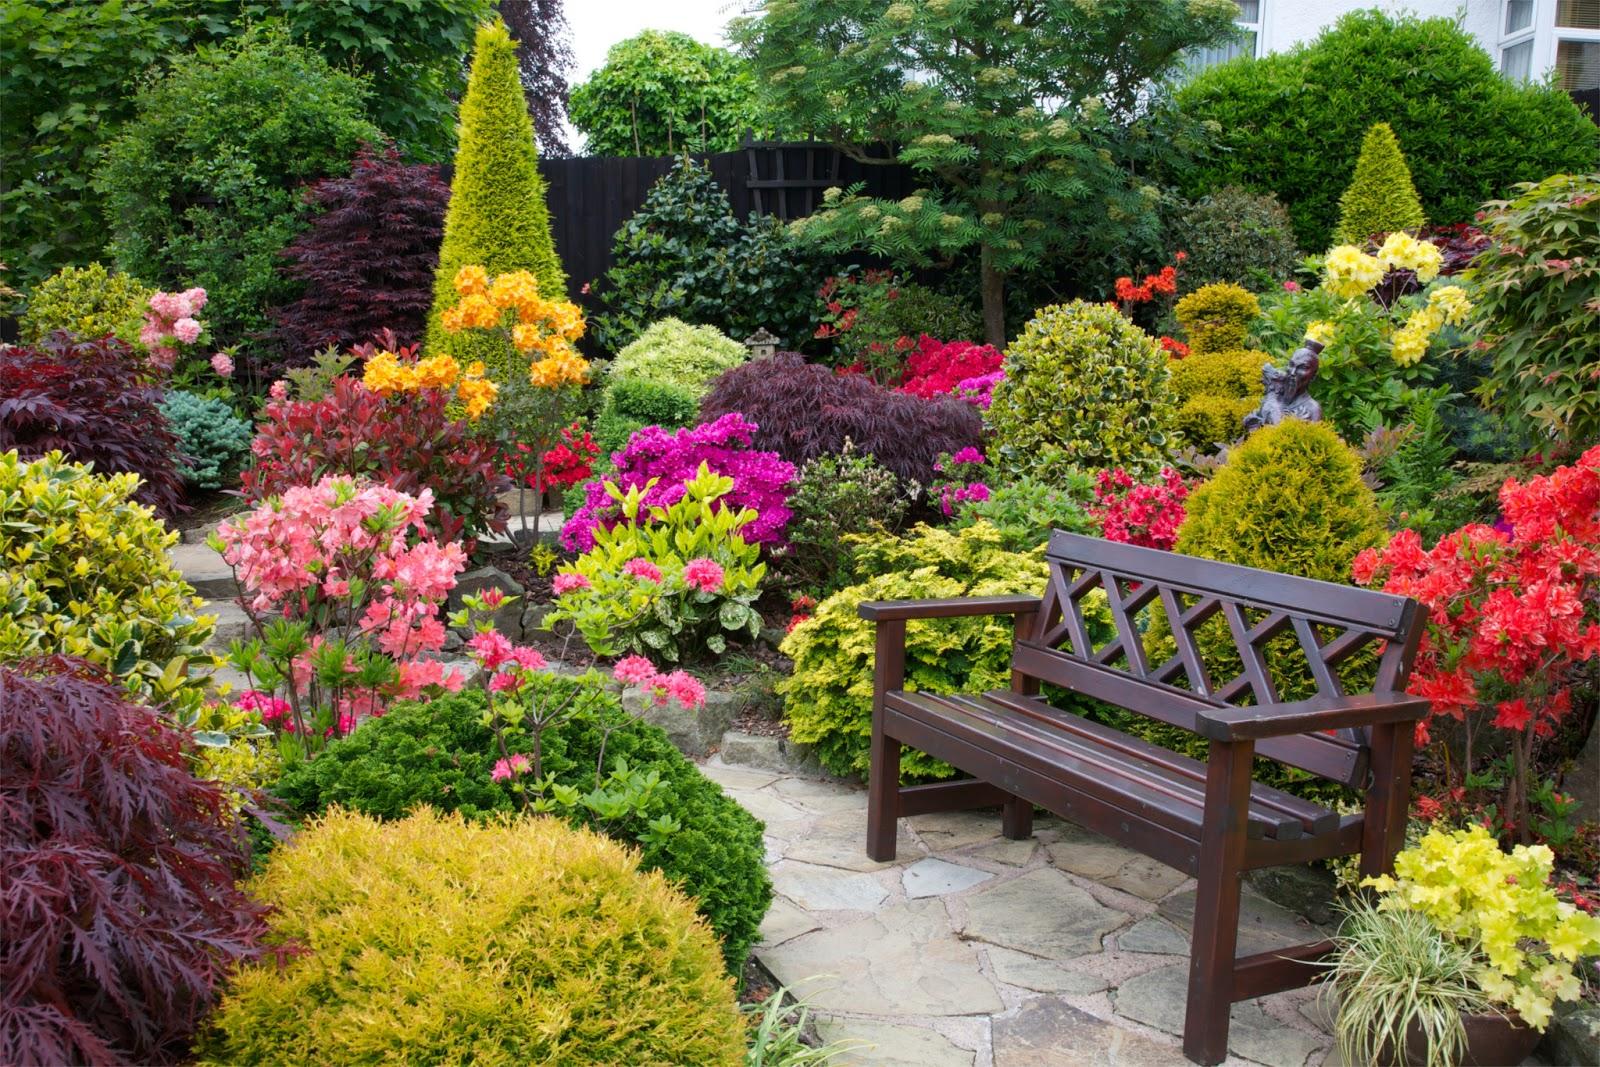 garden-seat-amongst-the-azalea-flowers